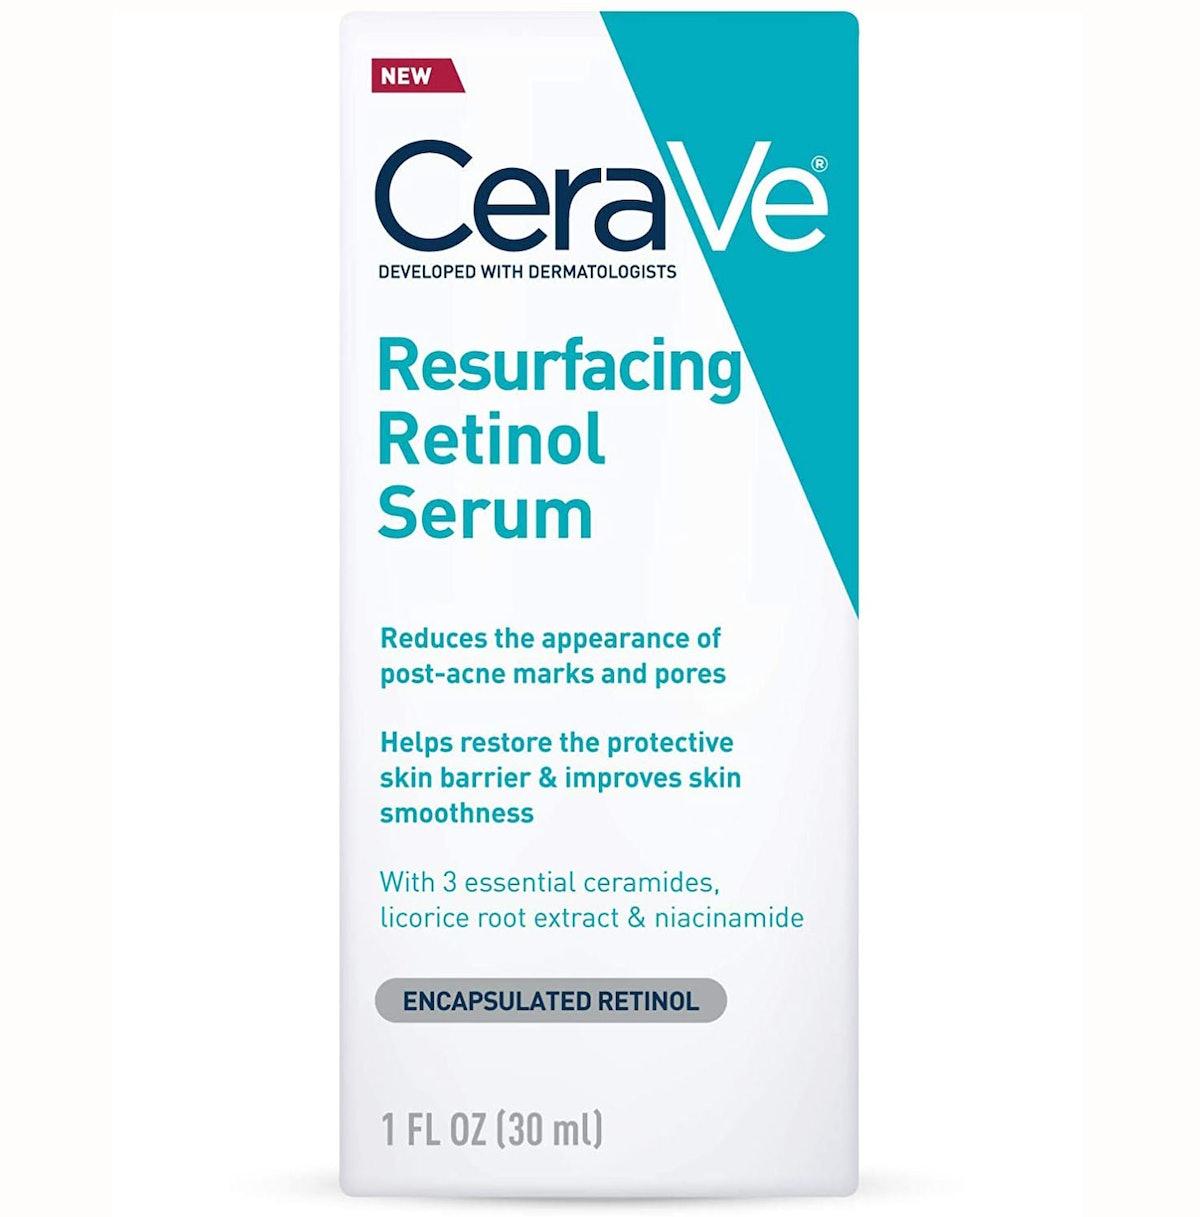 CeraVe Resurfacing Retinol Serum